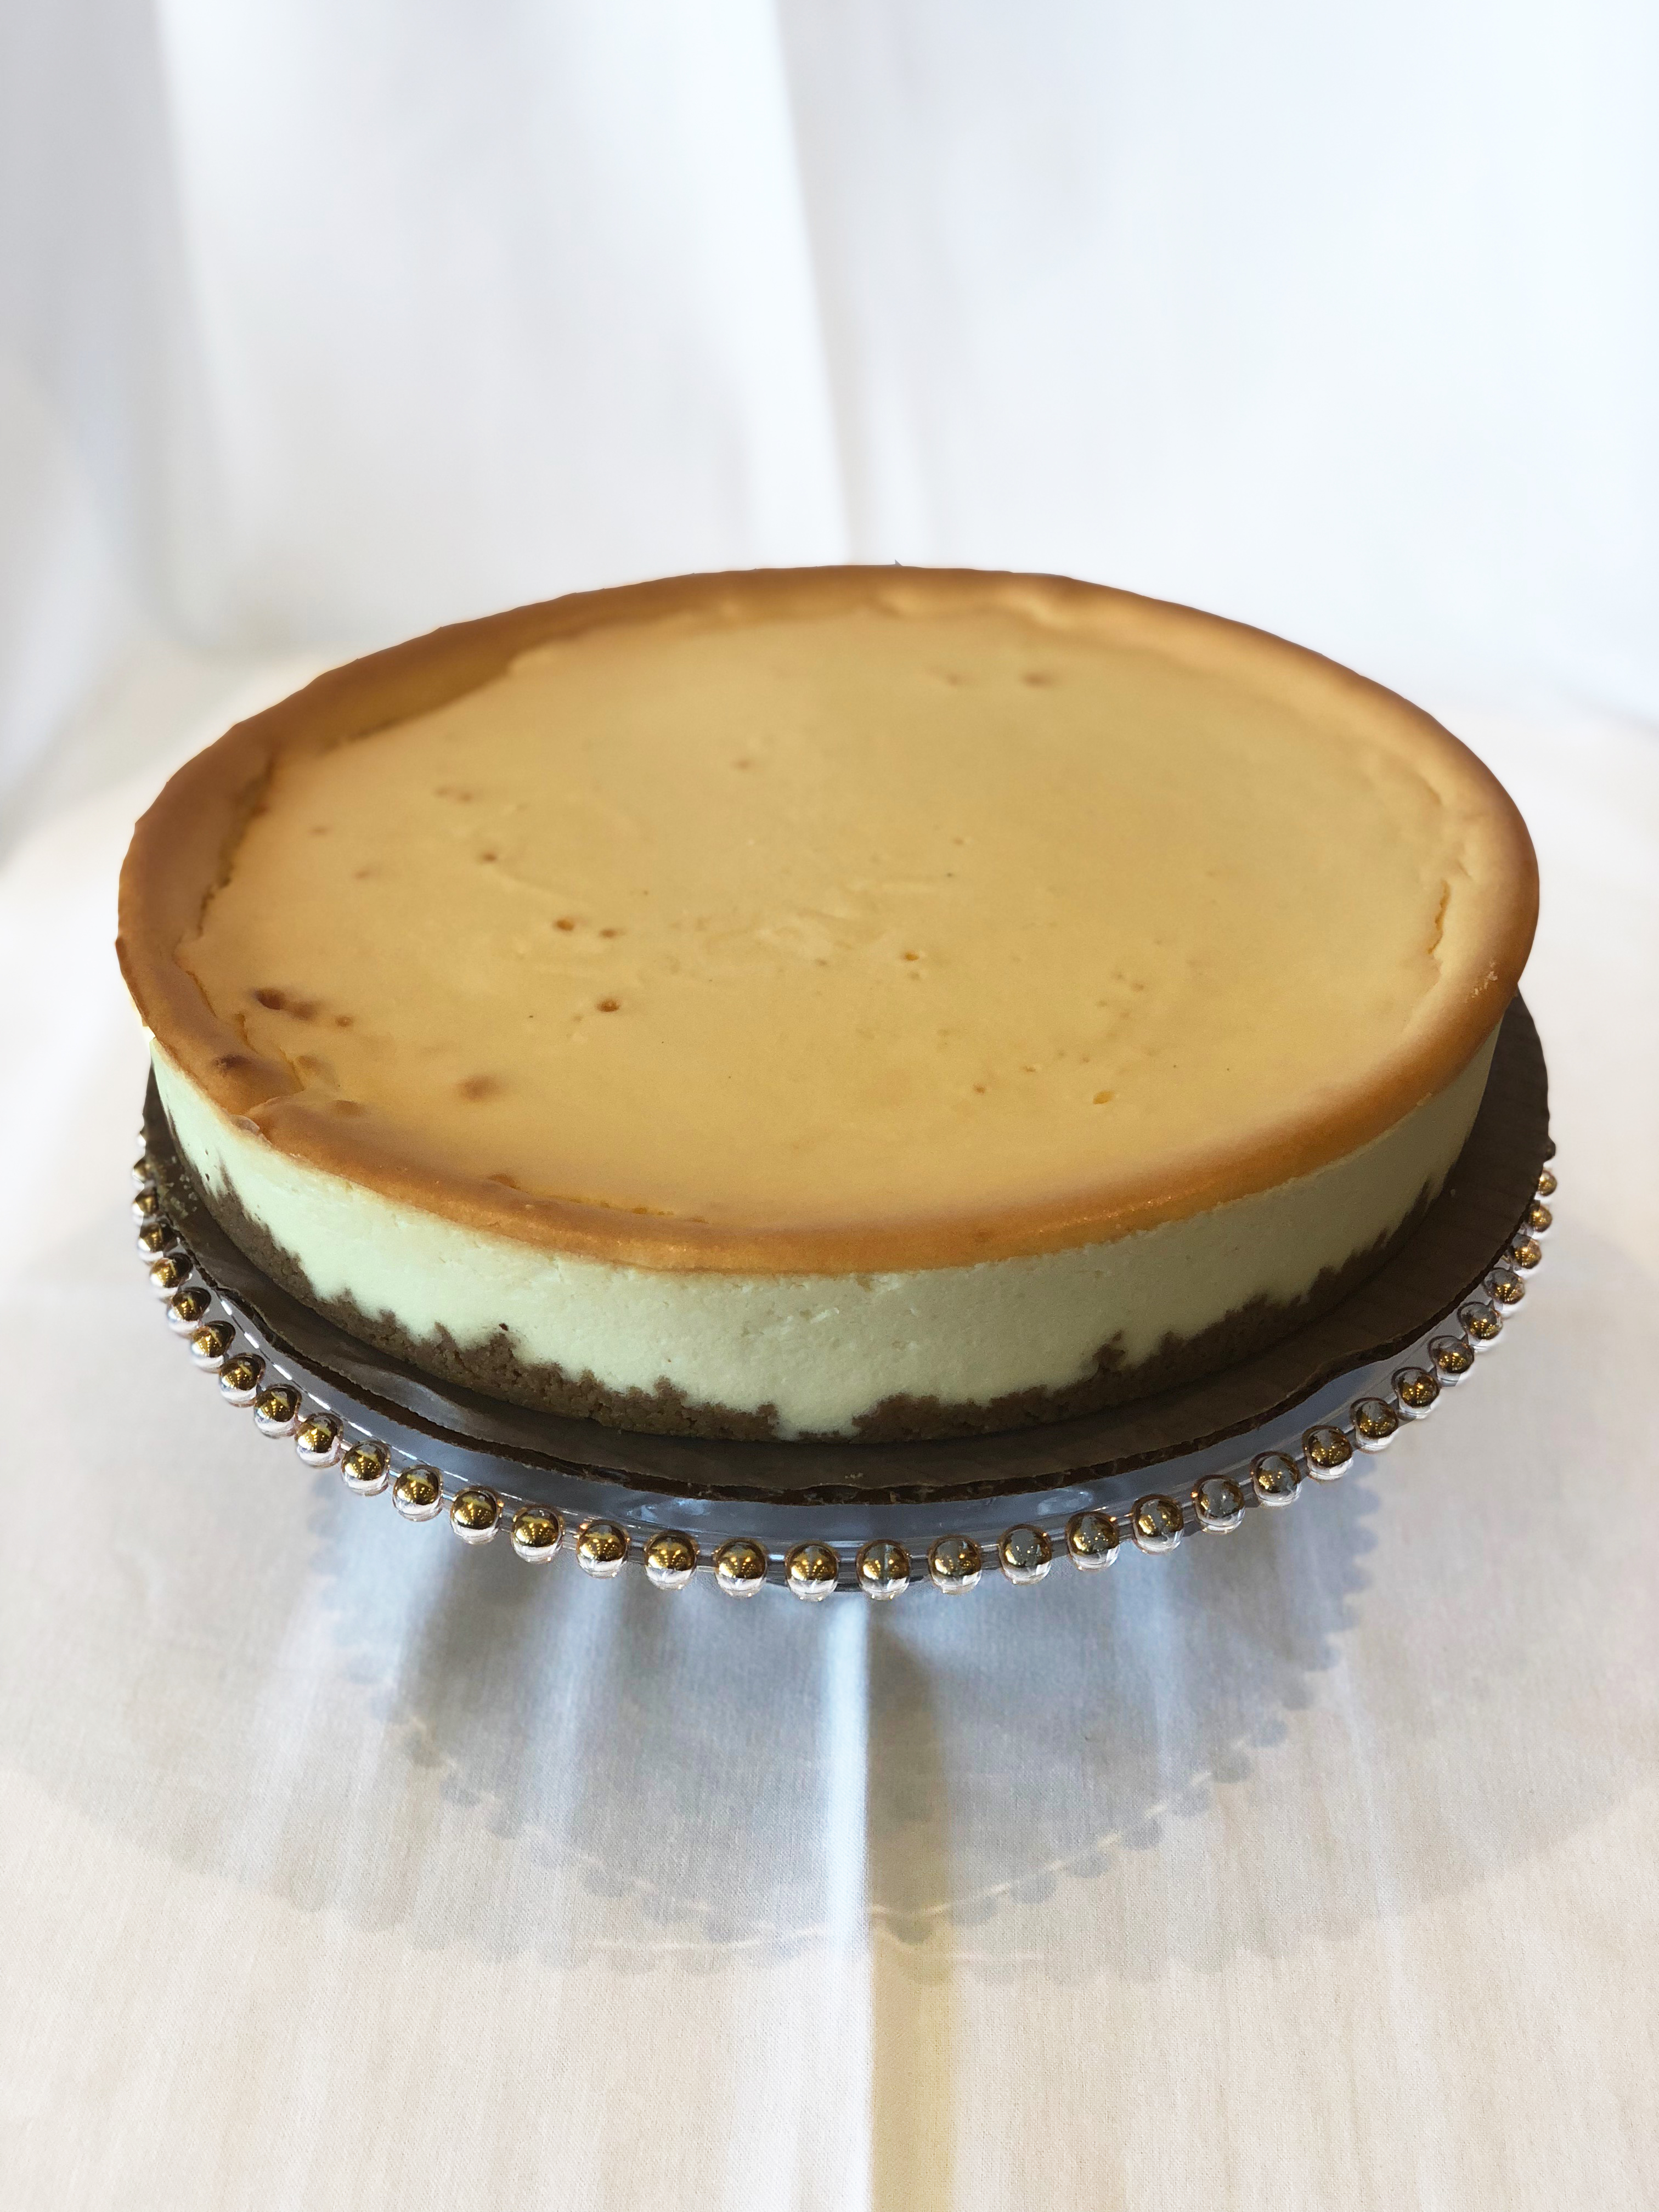 Whole New York Style Cheesecake Image